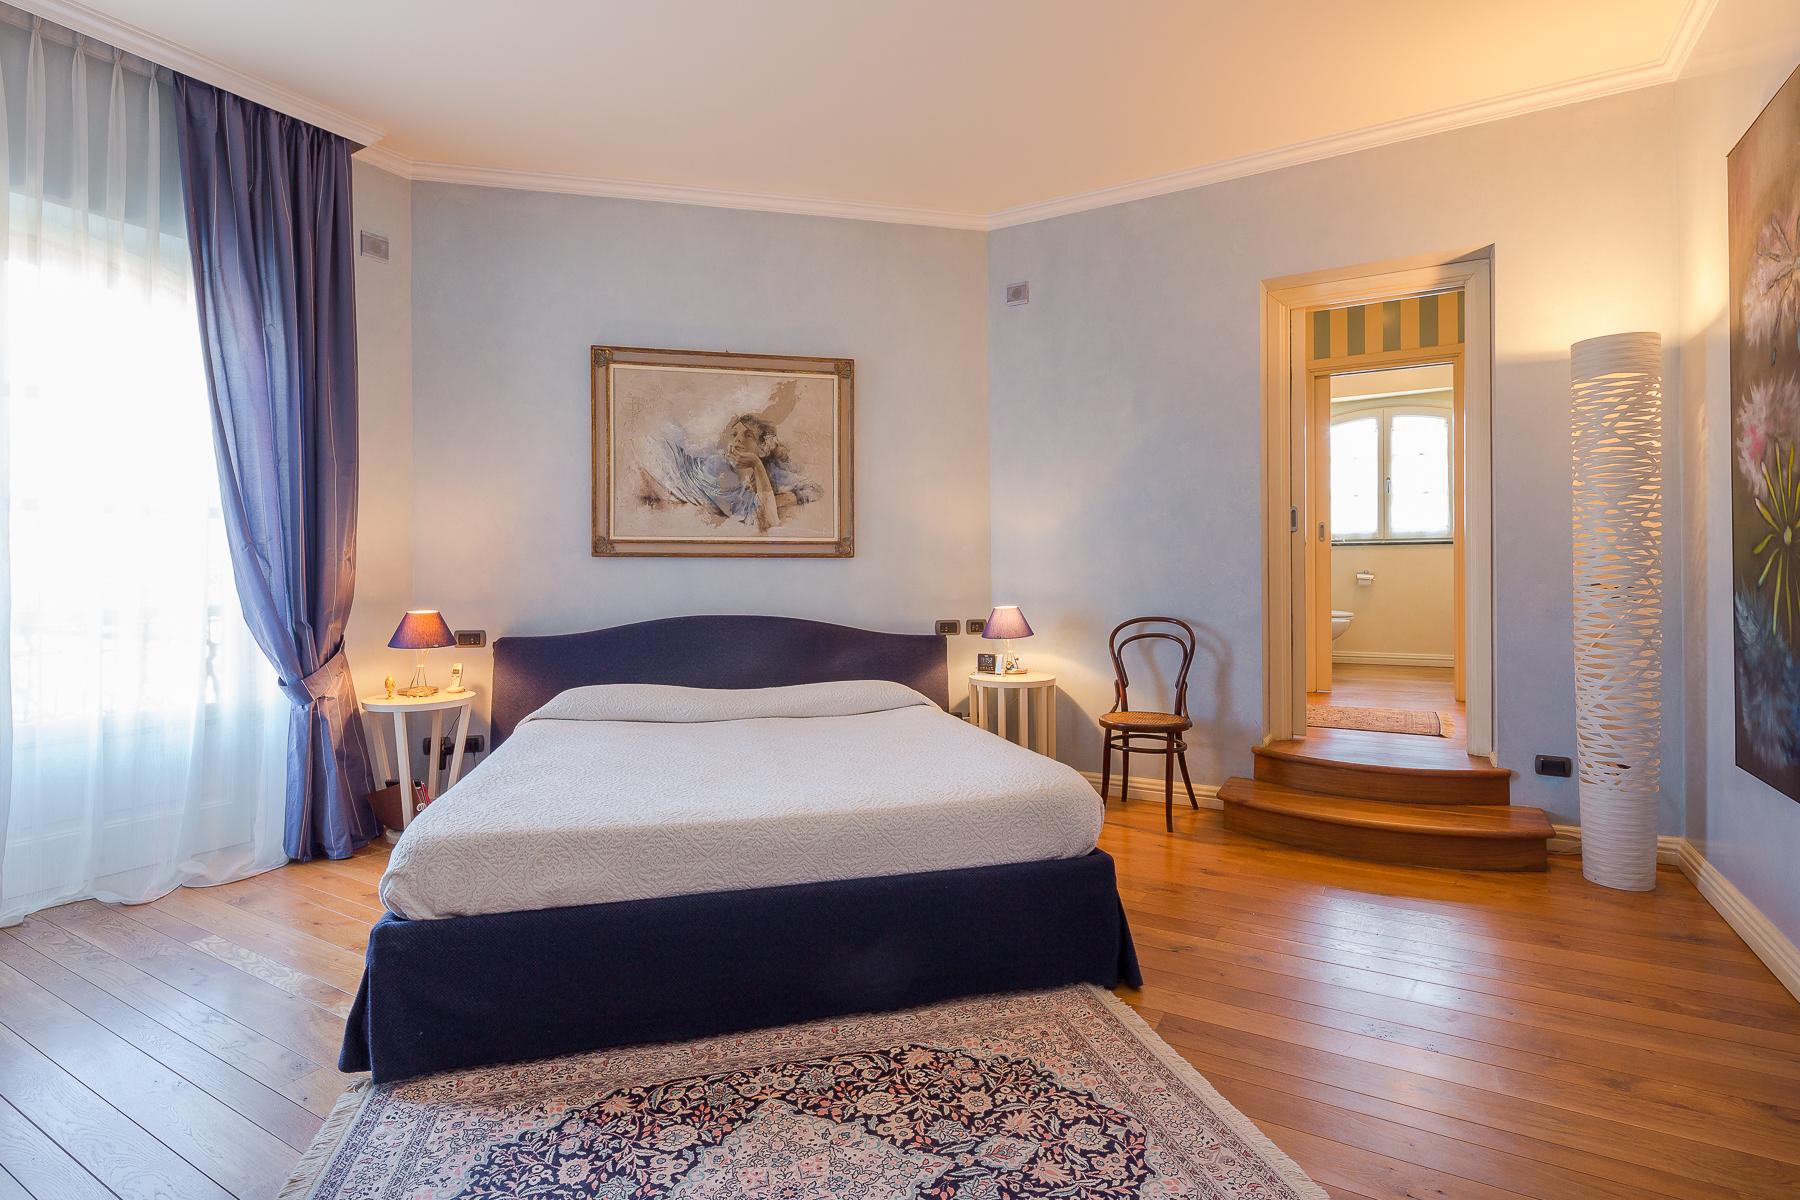 Villa in Vendita a Varese: 5 locali, 470 mq - Foto 23